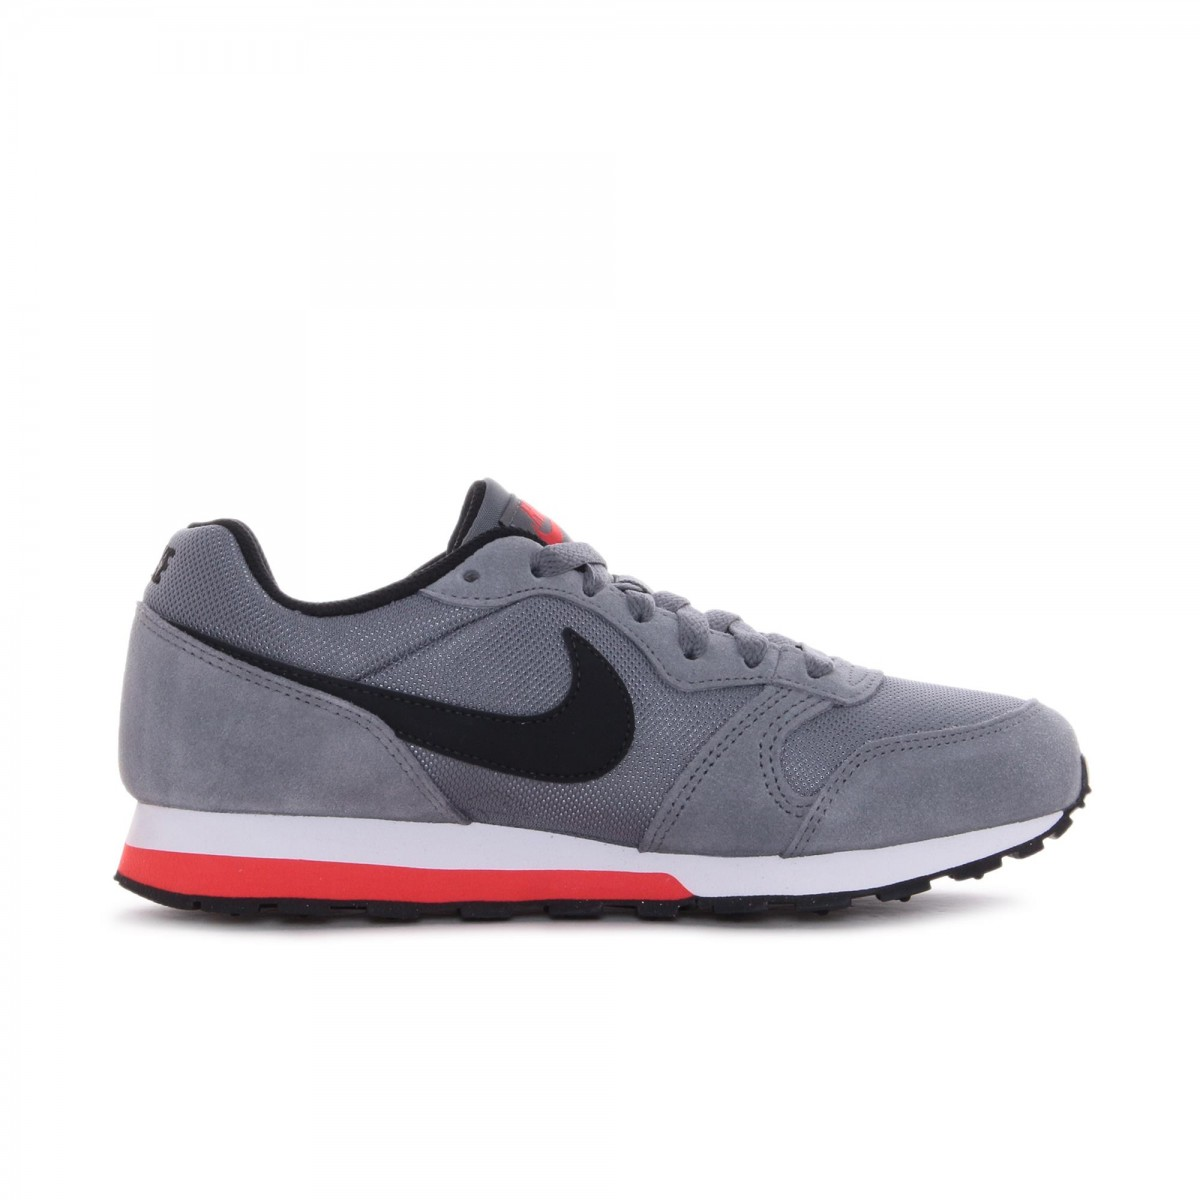 6fa70187f Bizz Store - Tênis Feminino Nike MD Runner 2 GS Corrida